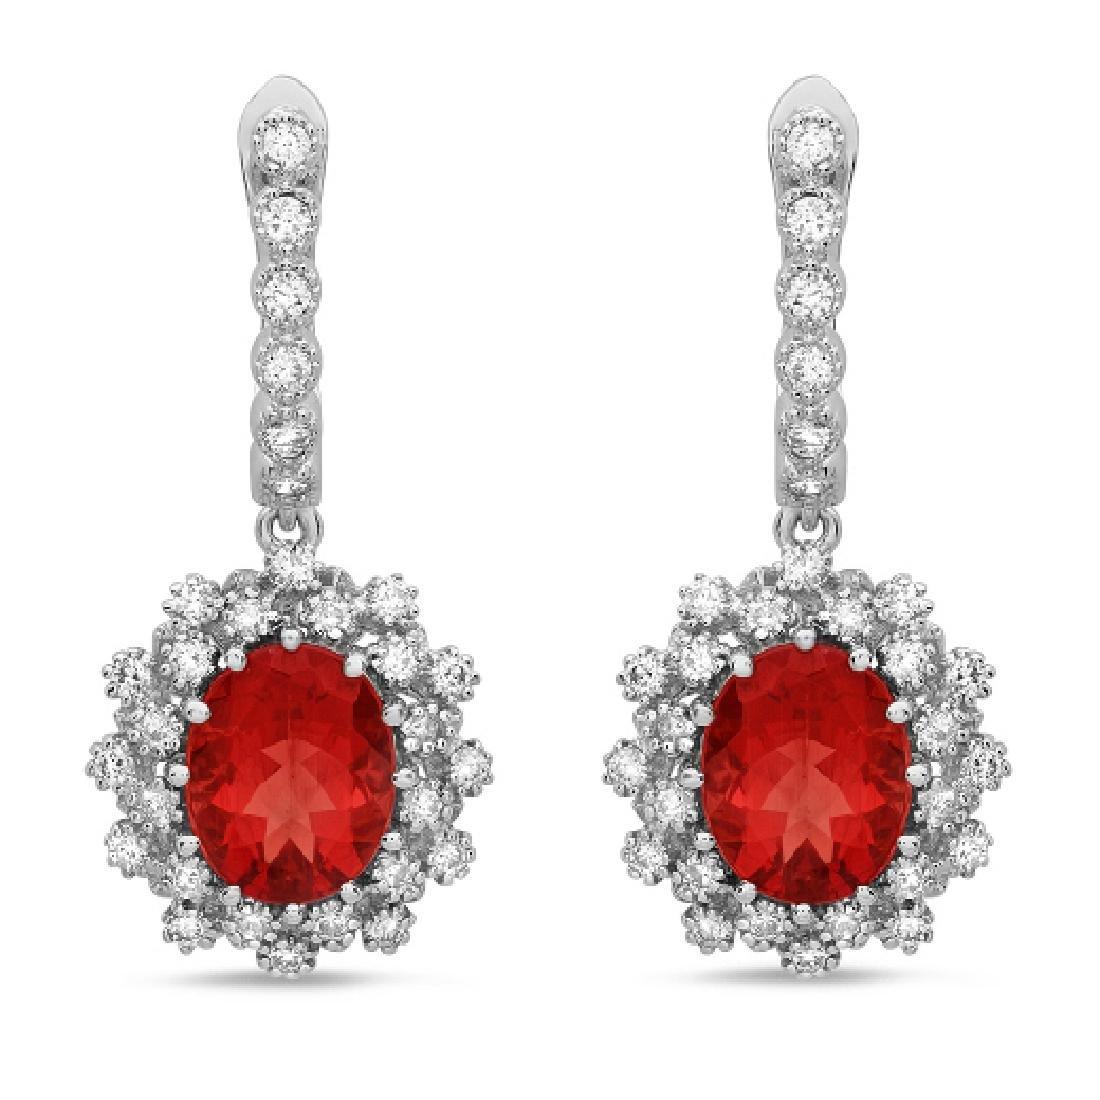 14K Gold 5.00ct Ruby & 1.30ct Diamond Earrings